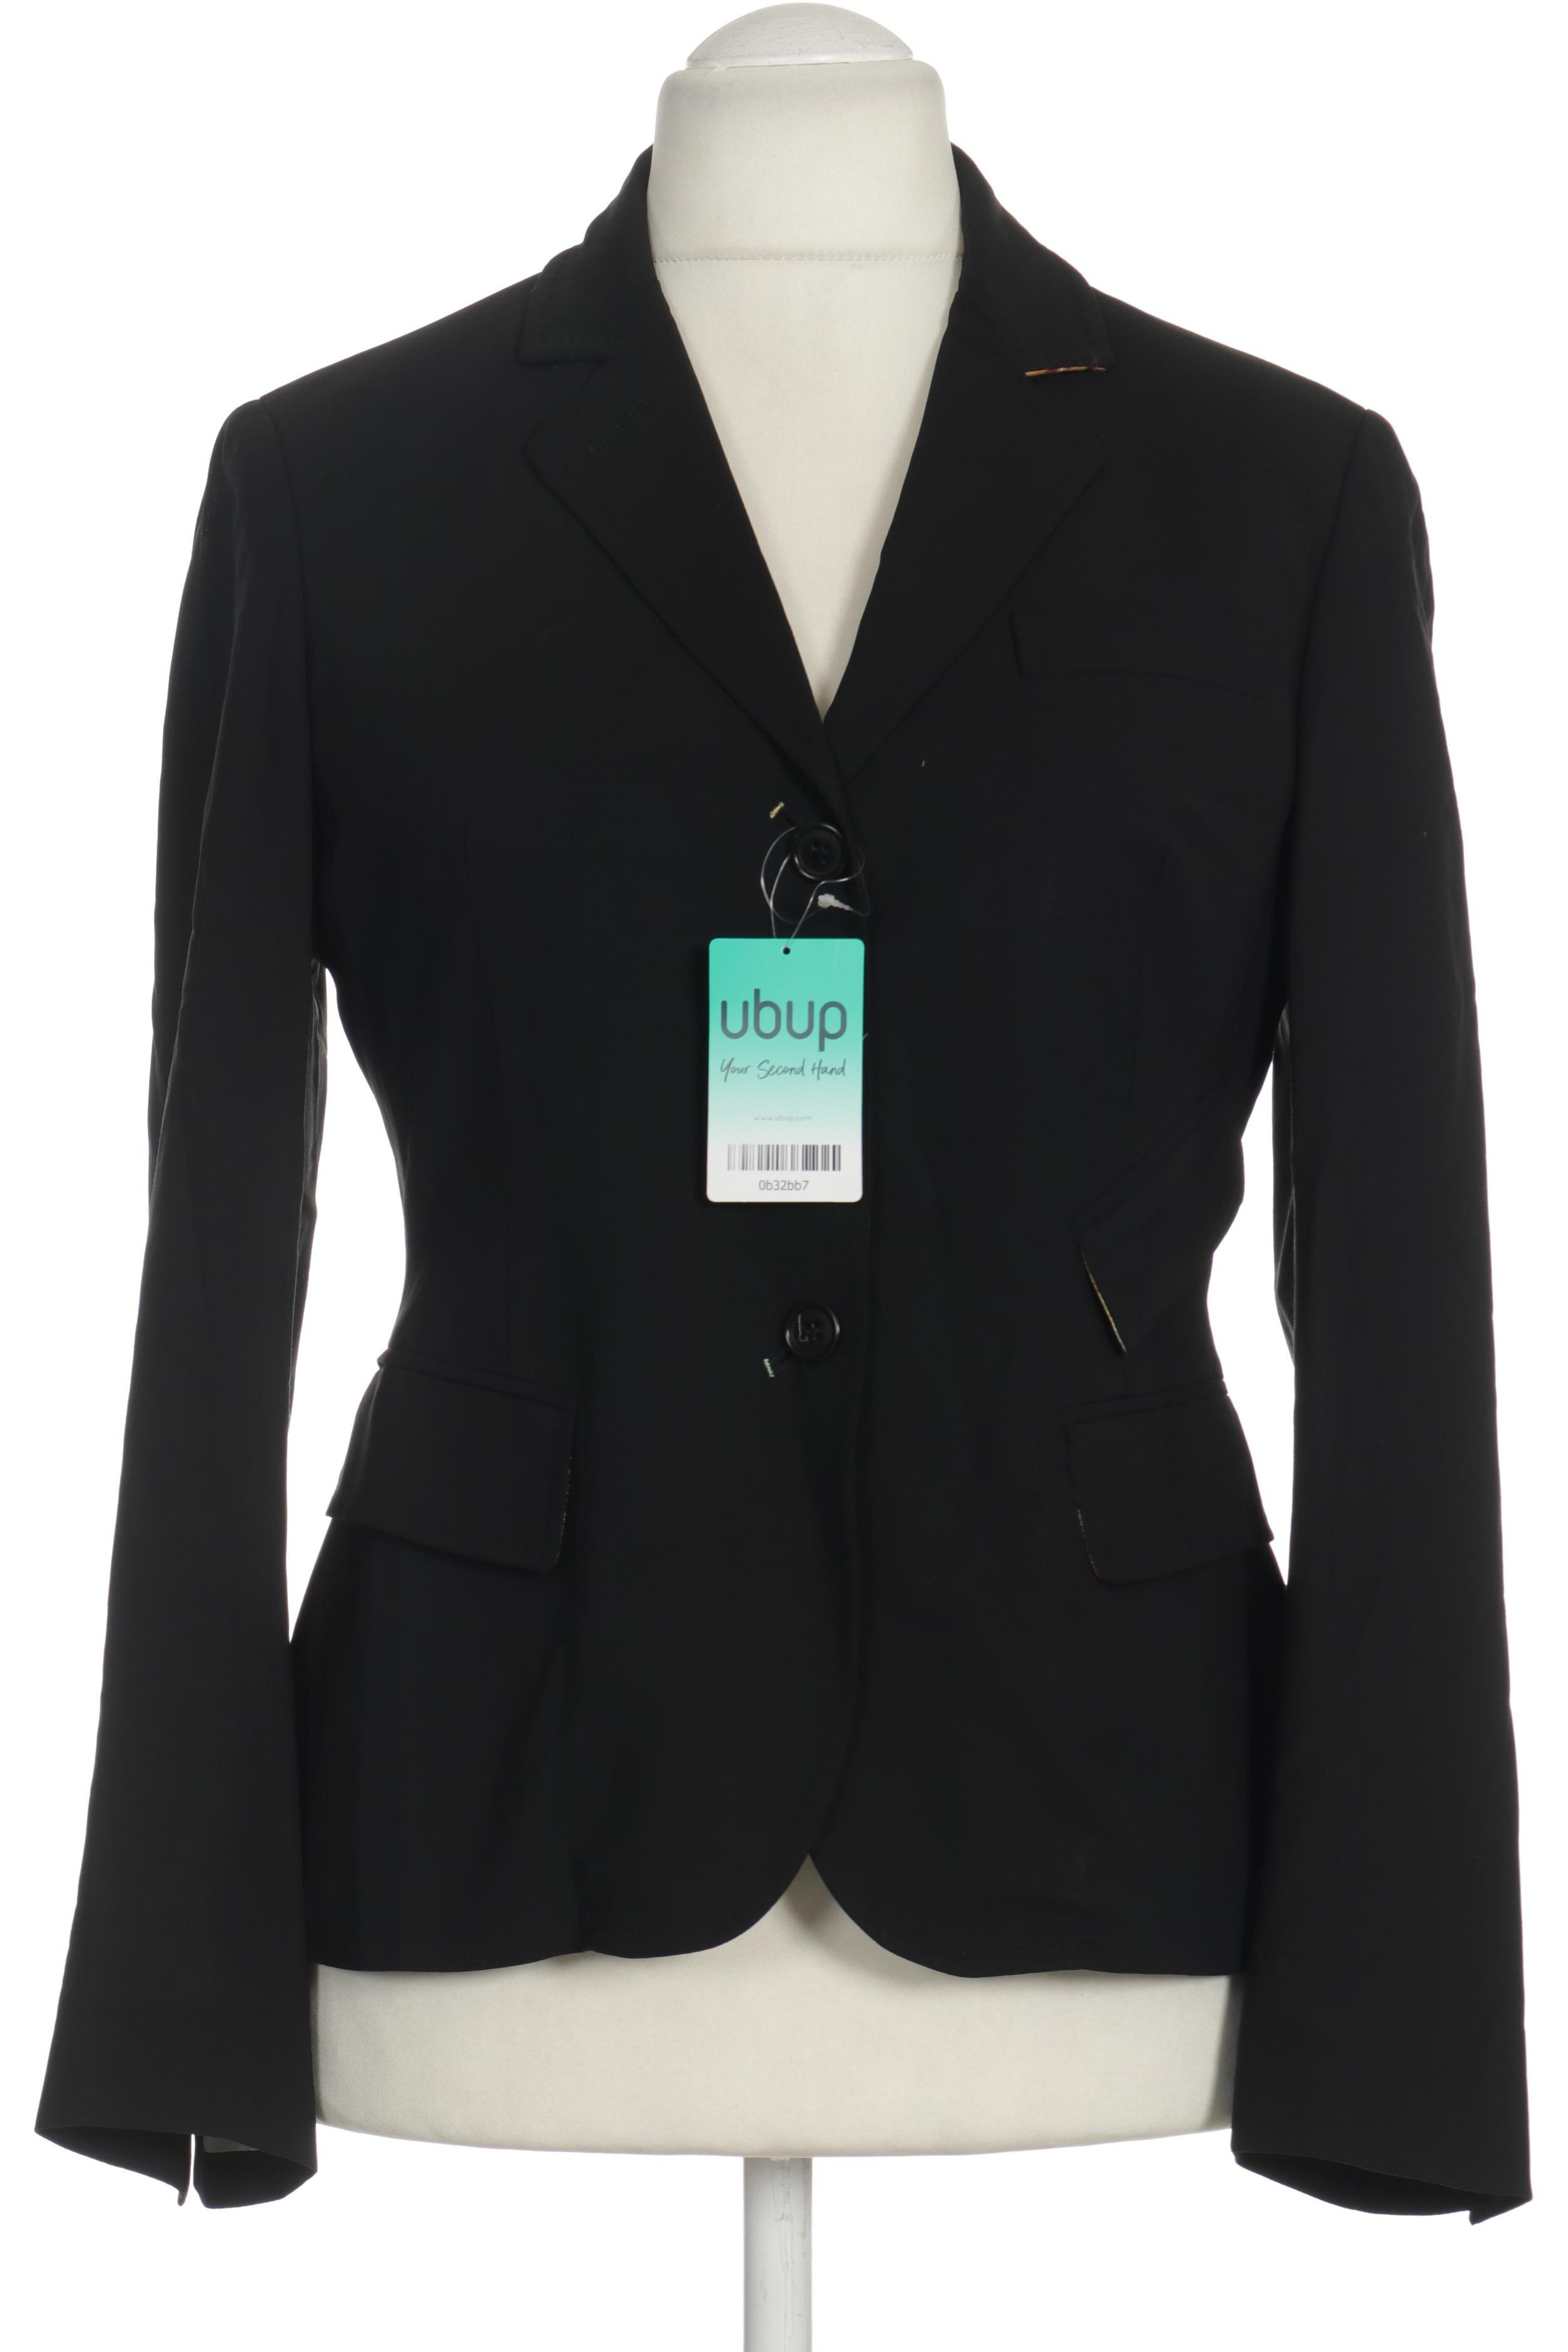 Details zu Paul Smith Blazer Damen Business Jacke Gr. IT 44 (DE 38) Elasthan, S #fc10e11